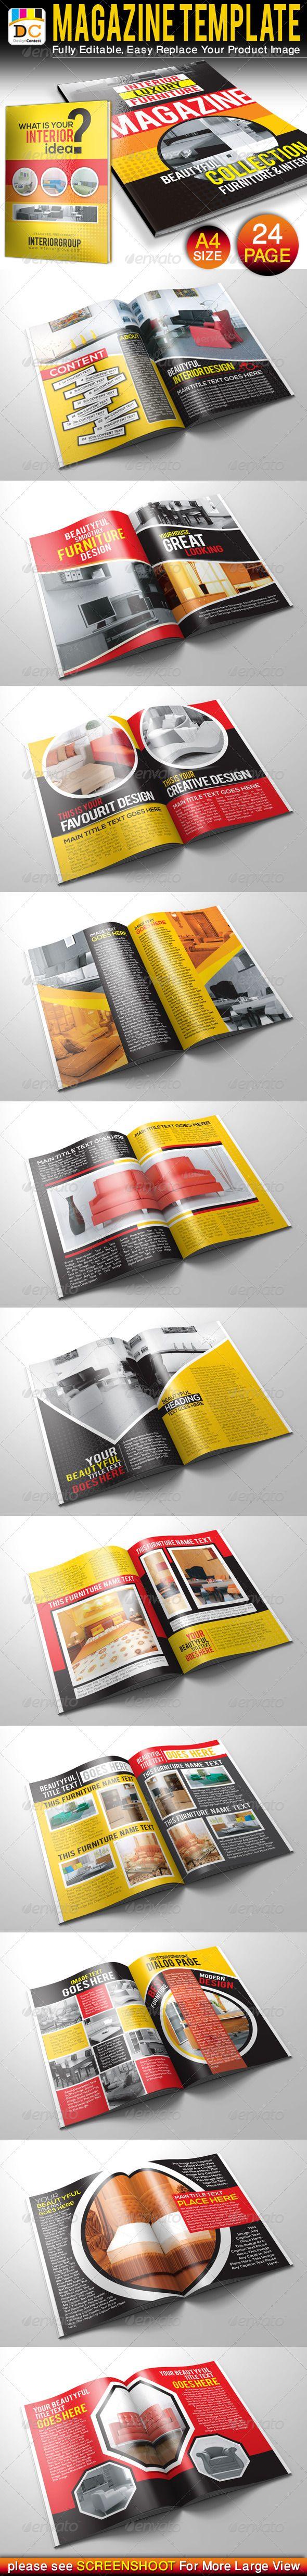 Furniture & Interior Magazine Template Vector EPS, AI Illustrator ...